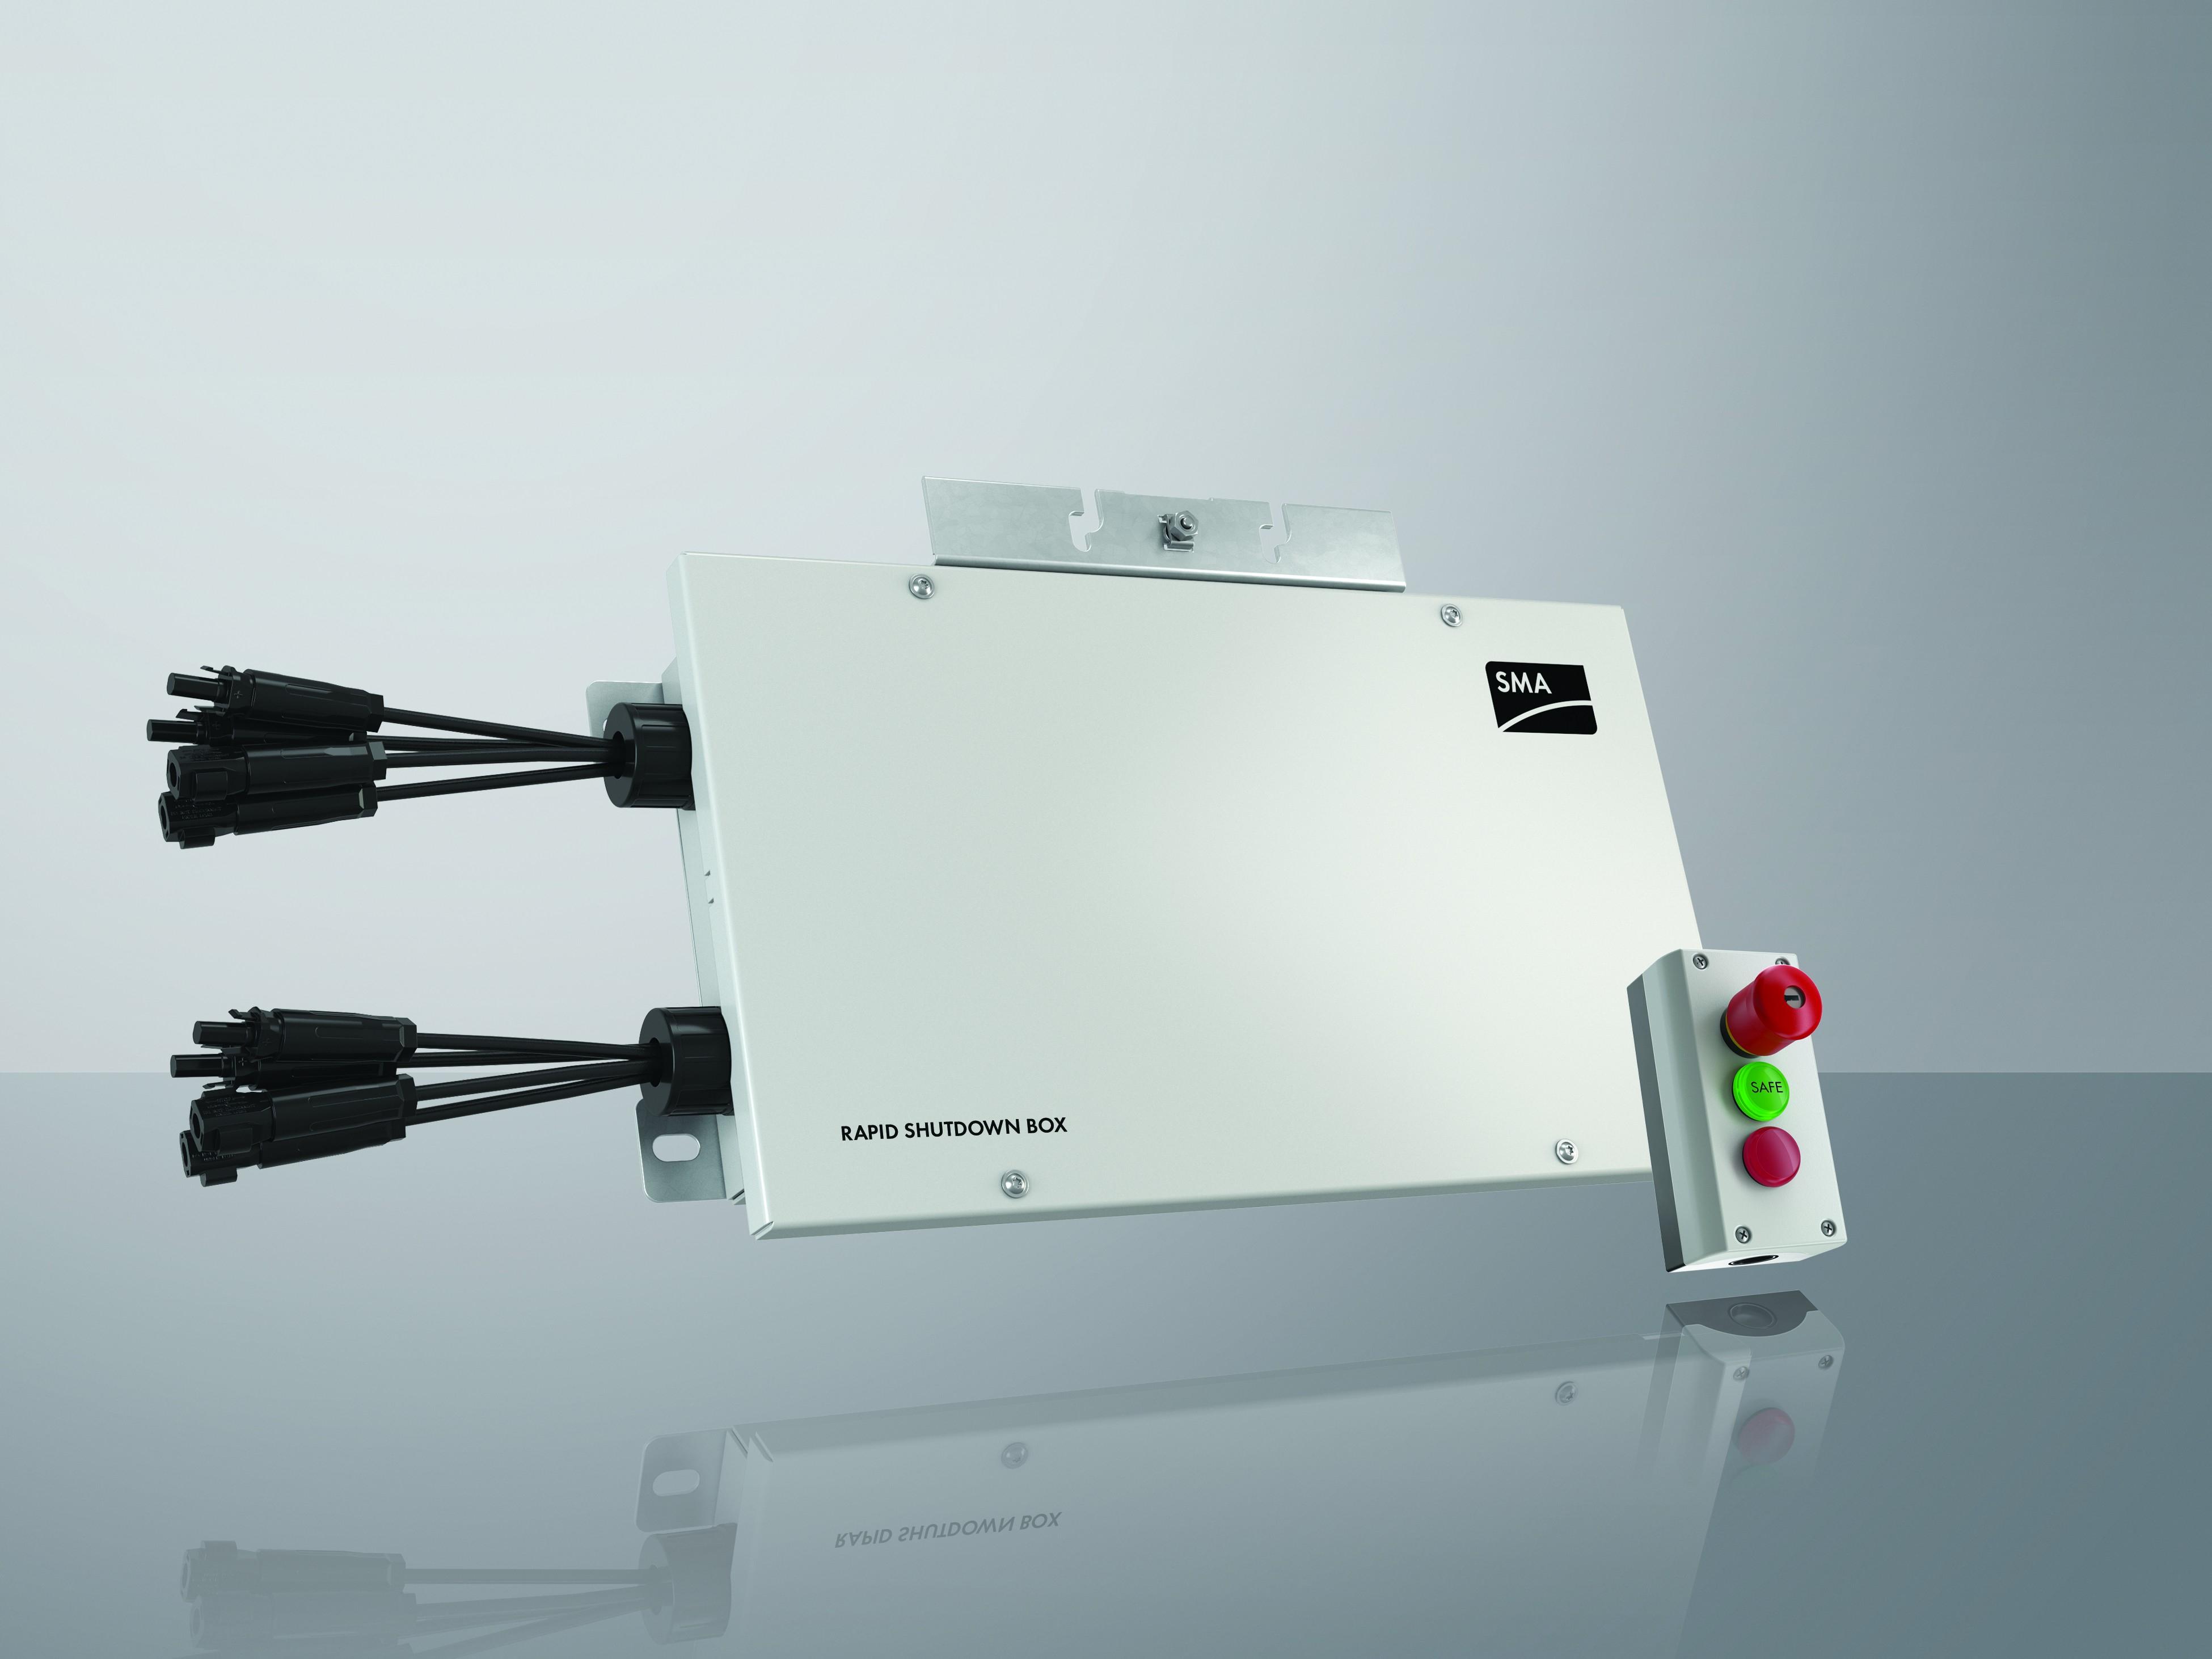 fronius rapid shutdown wiring diagram Collection-Sma Inverter Wiring Diagram Refrence Install Sma S Rapid Shutdown System 1-e